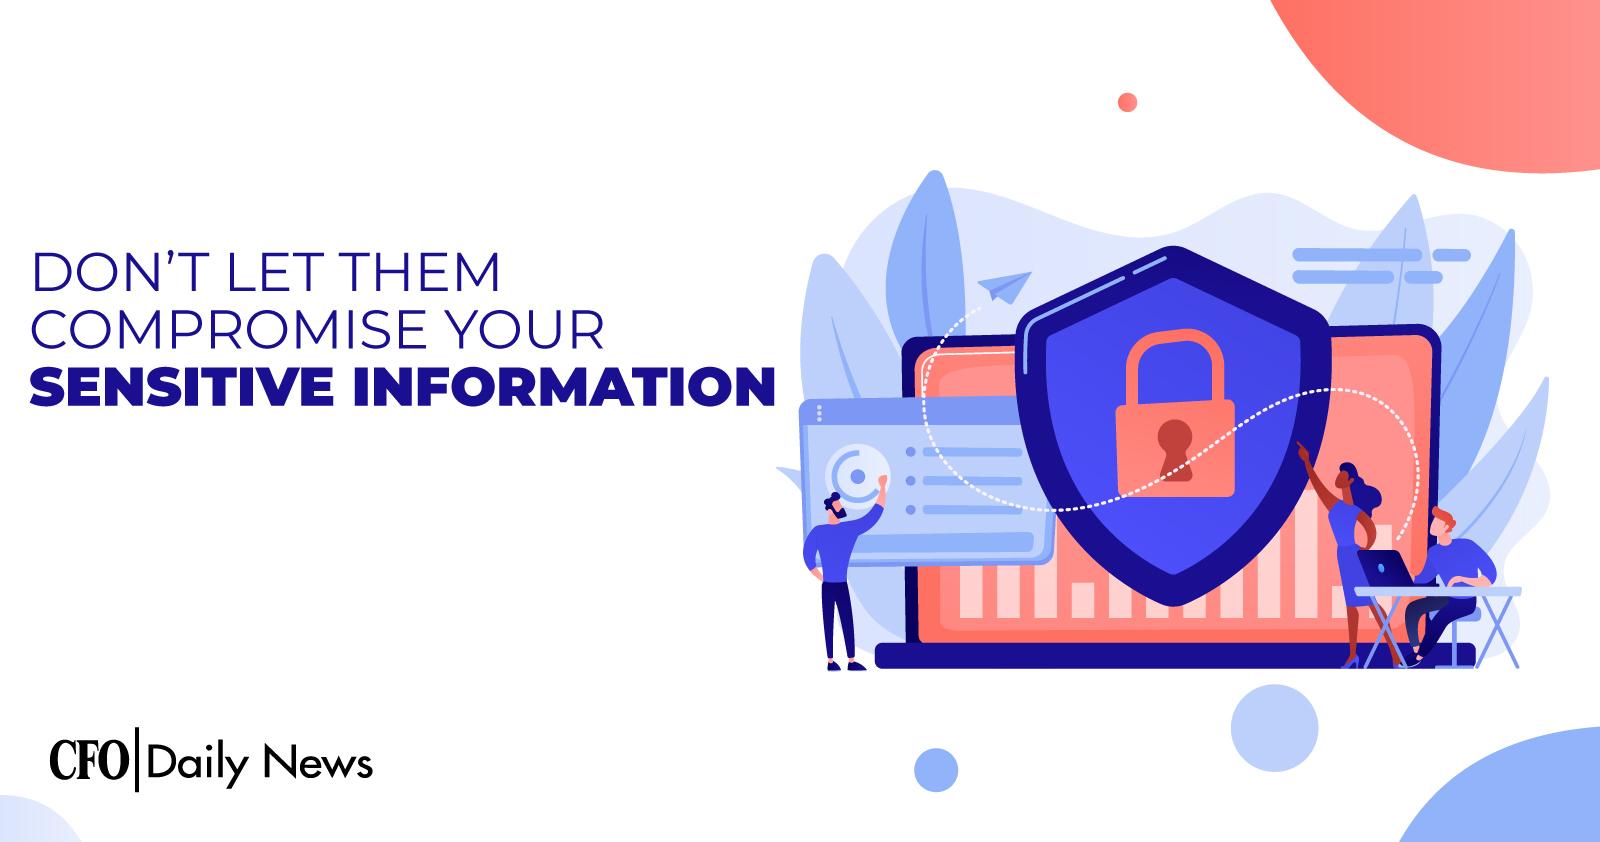 Don't Let Them Compromise Your Sensitive Information